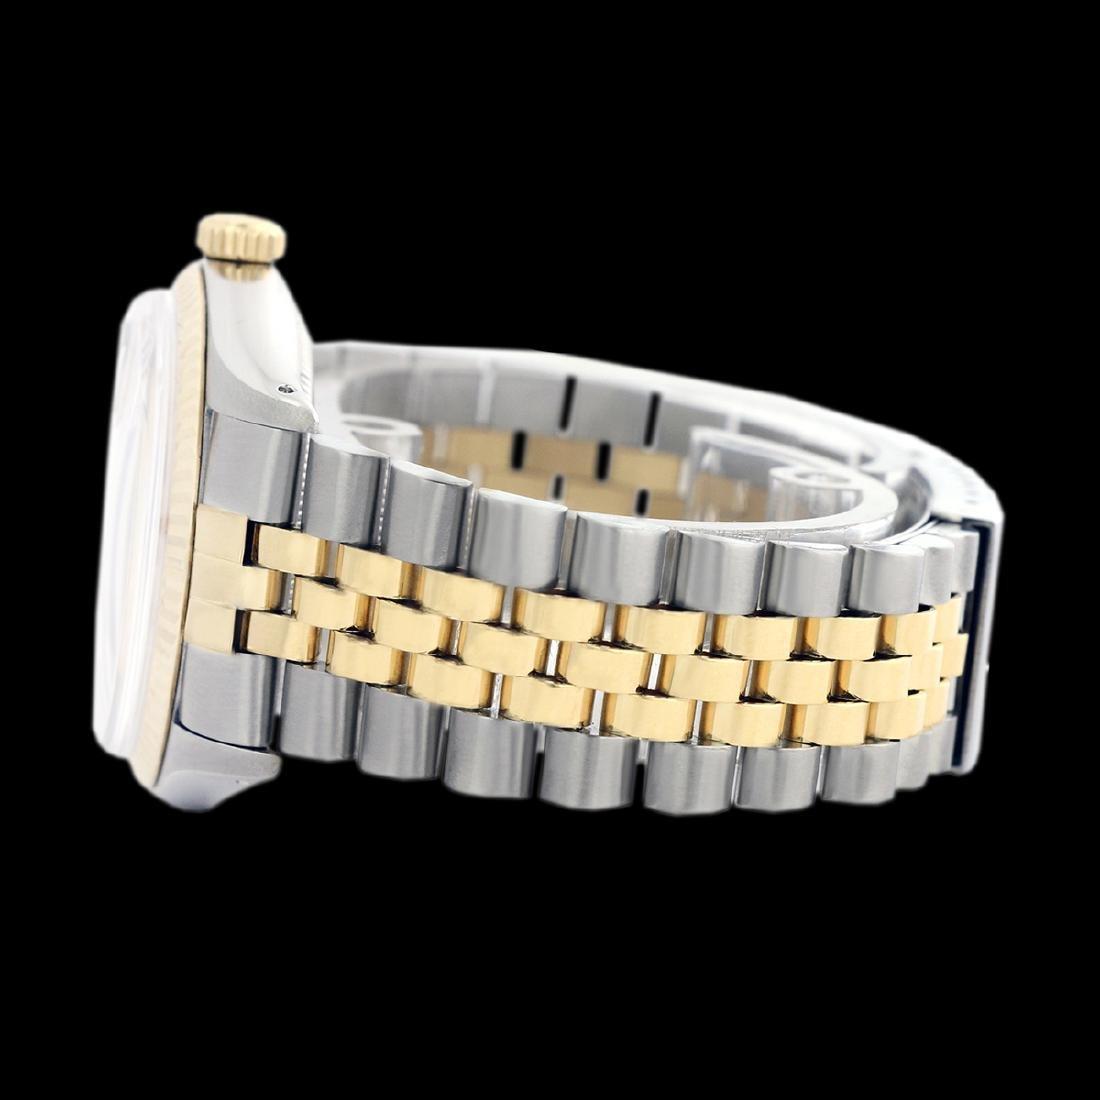 Rolex Men's Two Tone 14K Gold/SS, QuickSet, Diamond - 4